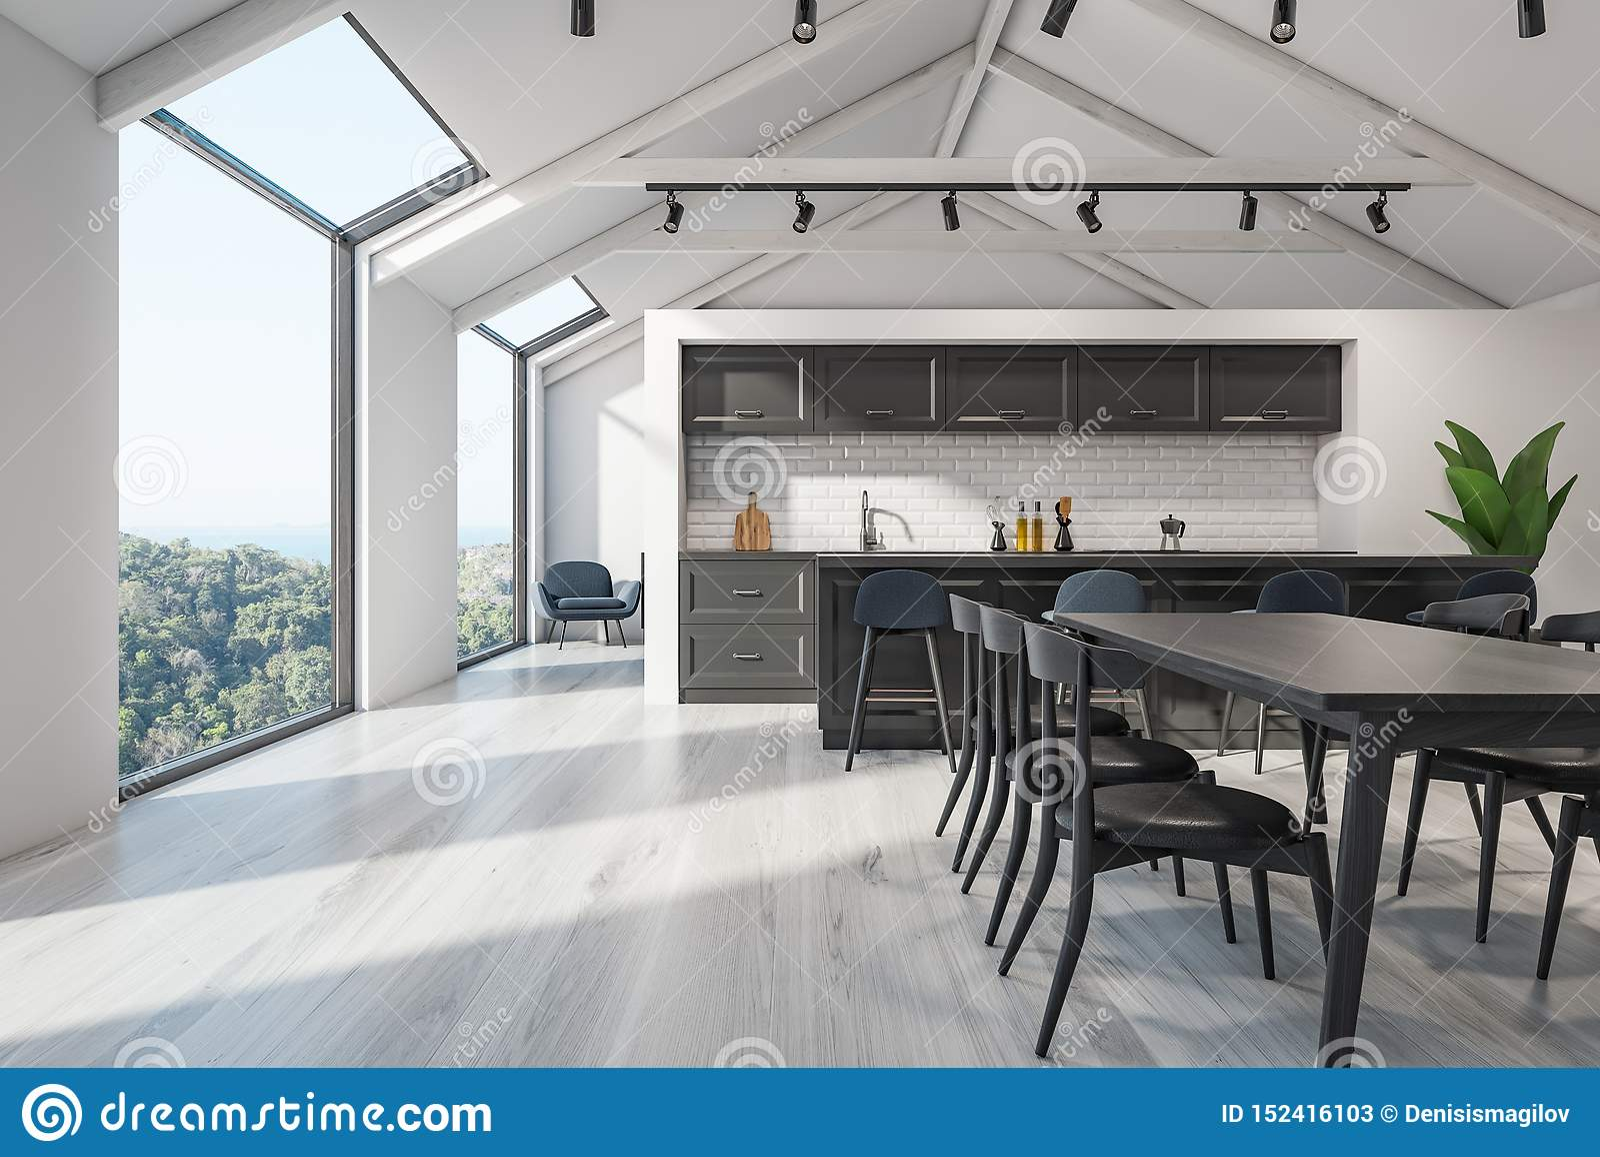 Scandinavian Kitchen Interior, Bar And Table Stock Illustration ...